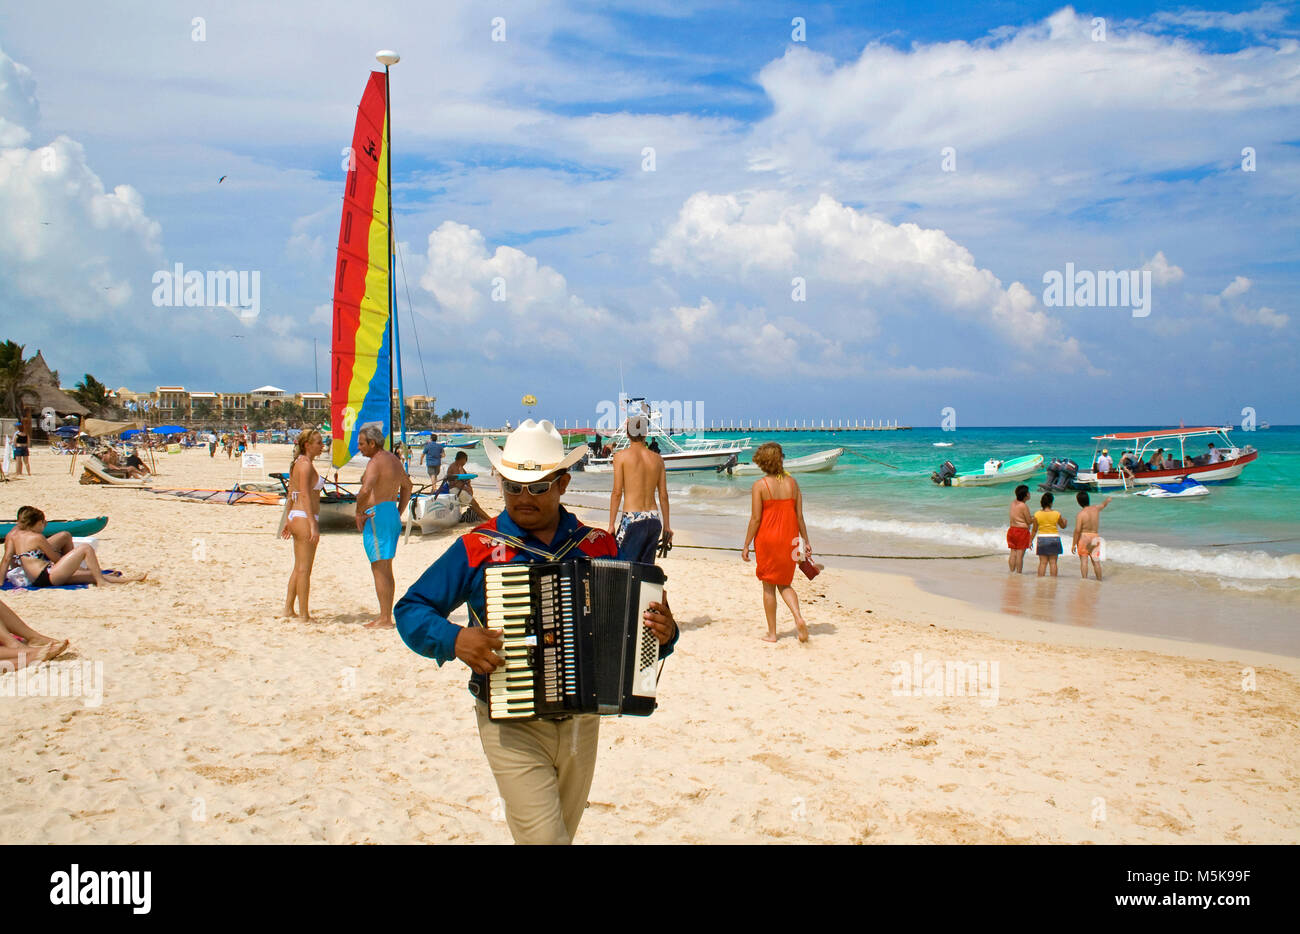 Mexikanische Mann spielt Akkordeon am Strand von Playa del Carmen, Mexiko, Karibik Stockbild